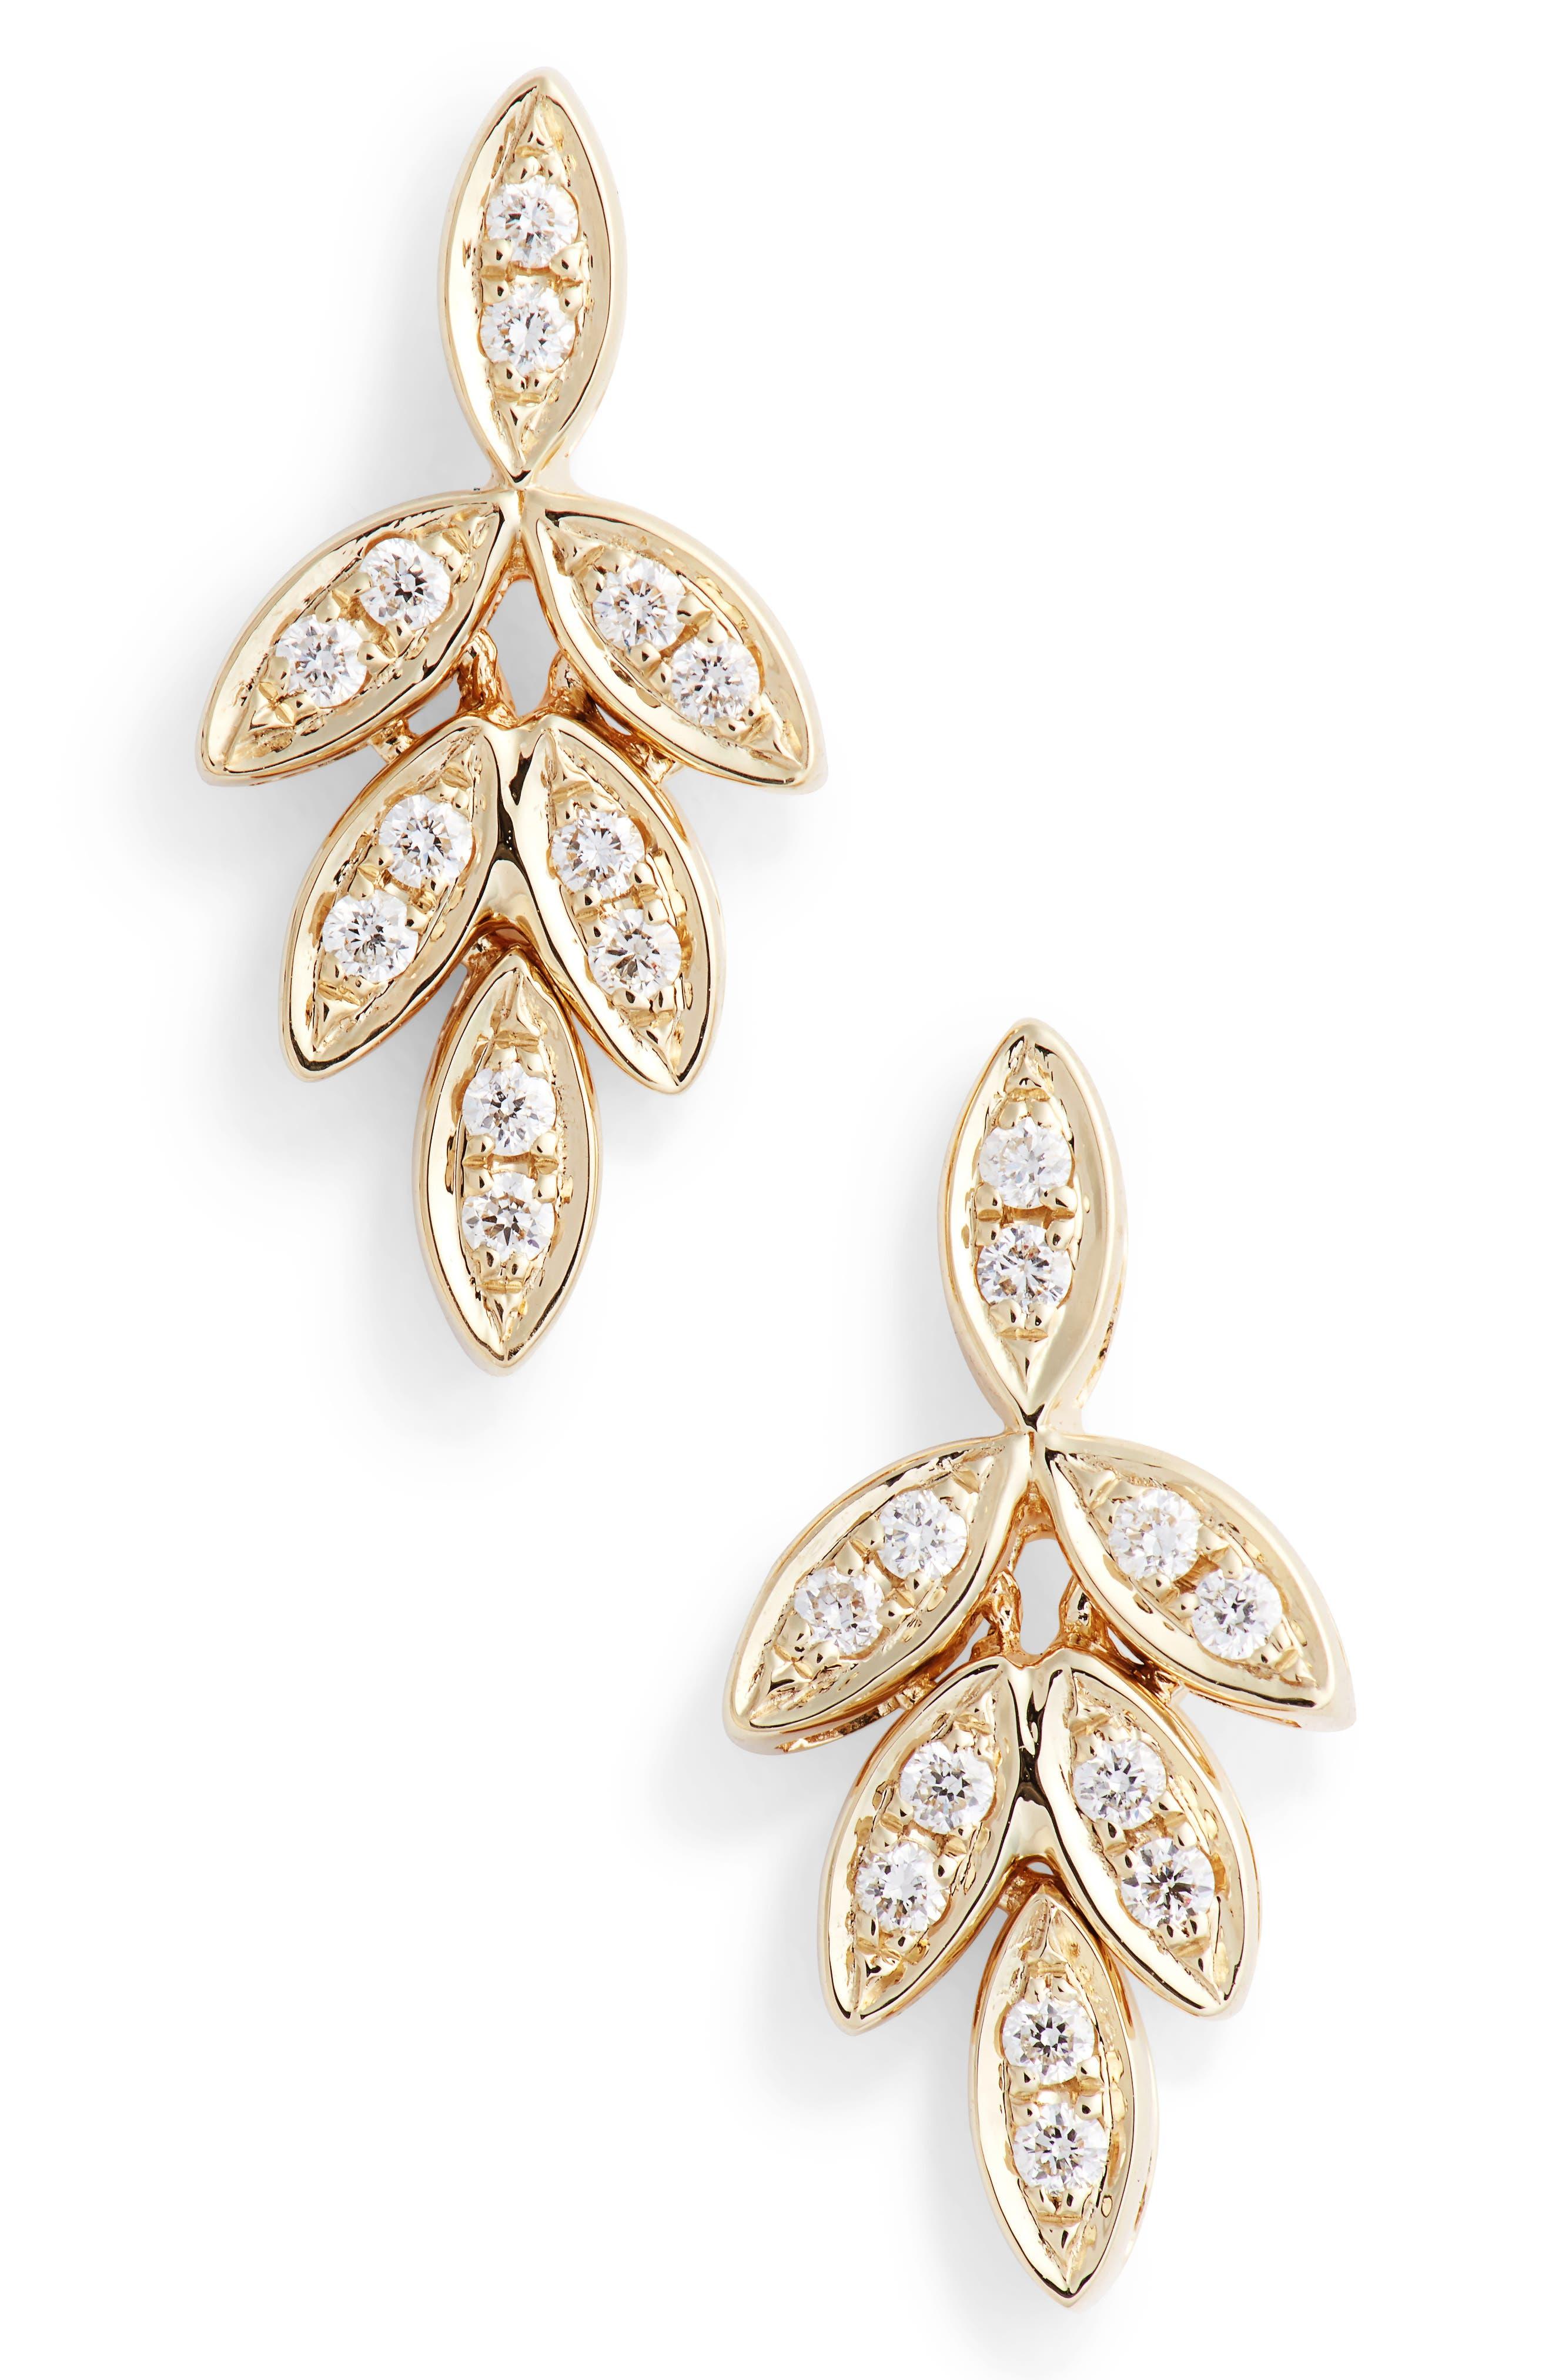 Dana Rebecca Lori Paige Diamond Leaf Stud Earrings